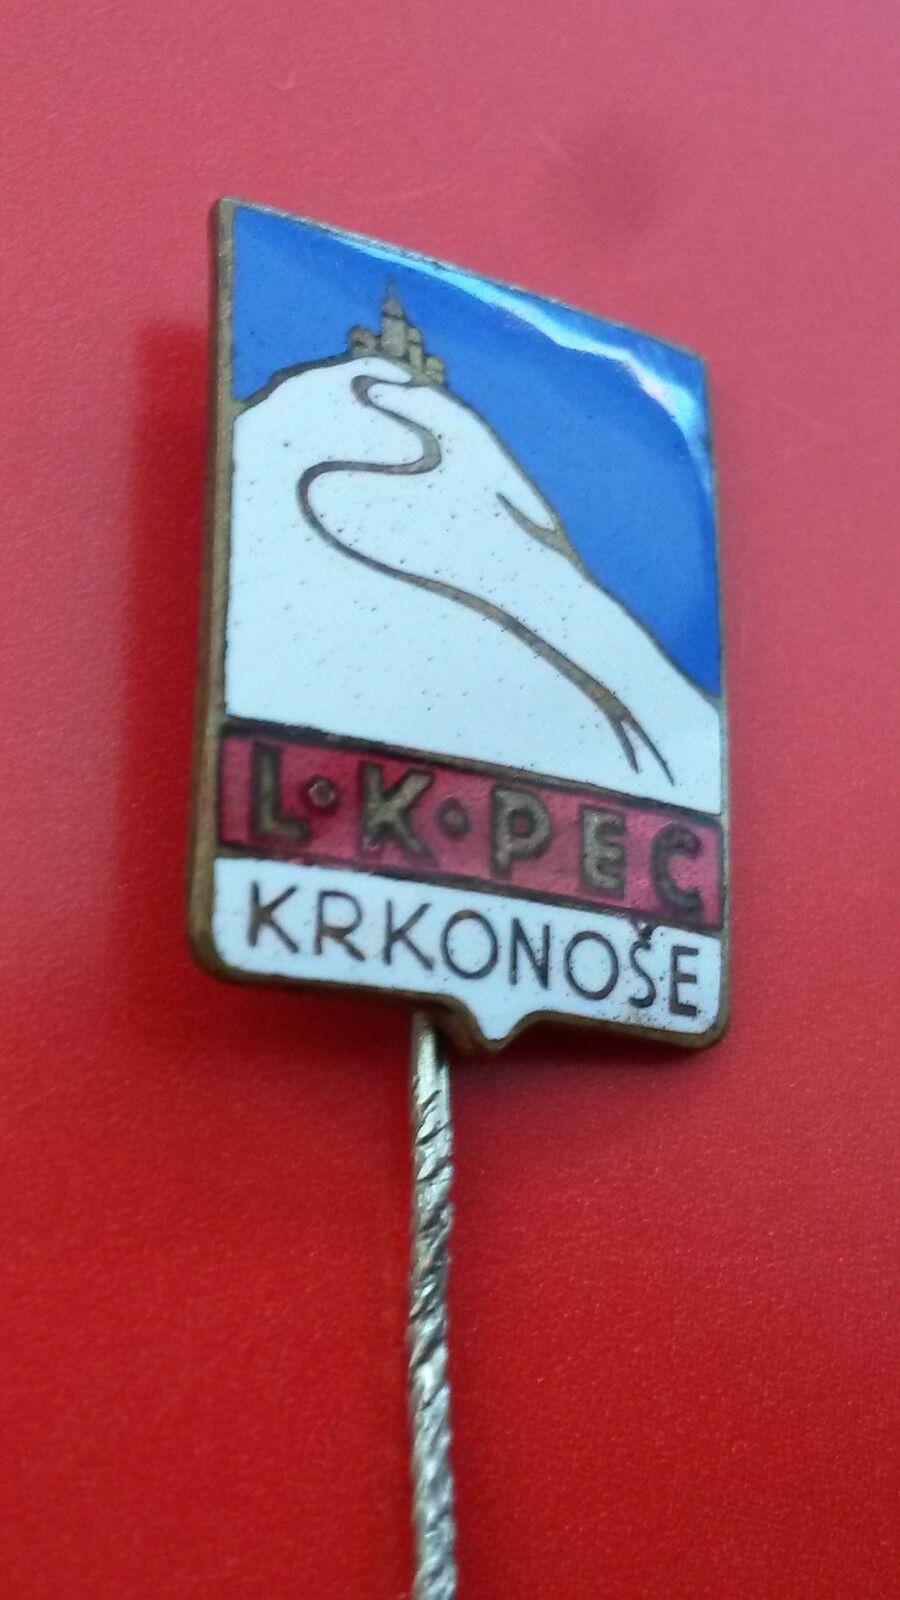 LK Pec Krkonose vintage  ski club vintage Krkonose enameling badge from 1930´s 27b4d2